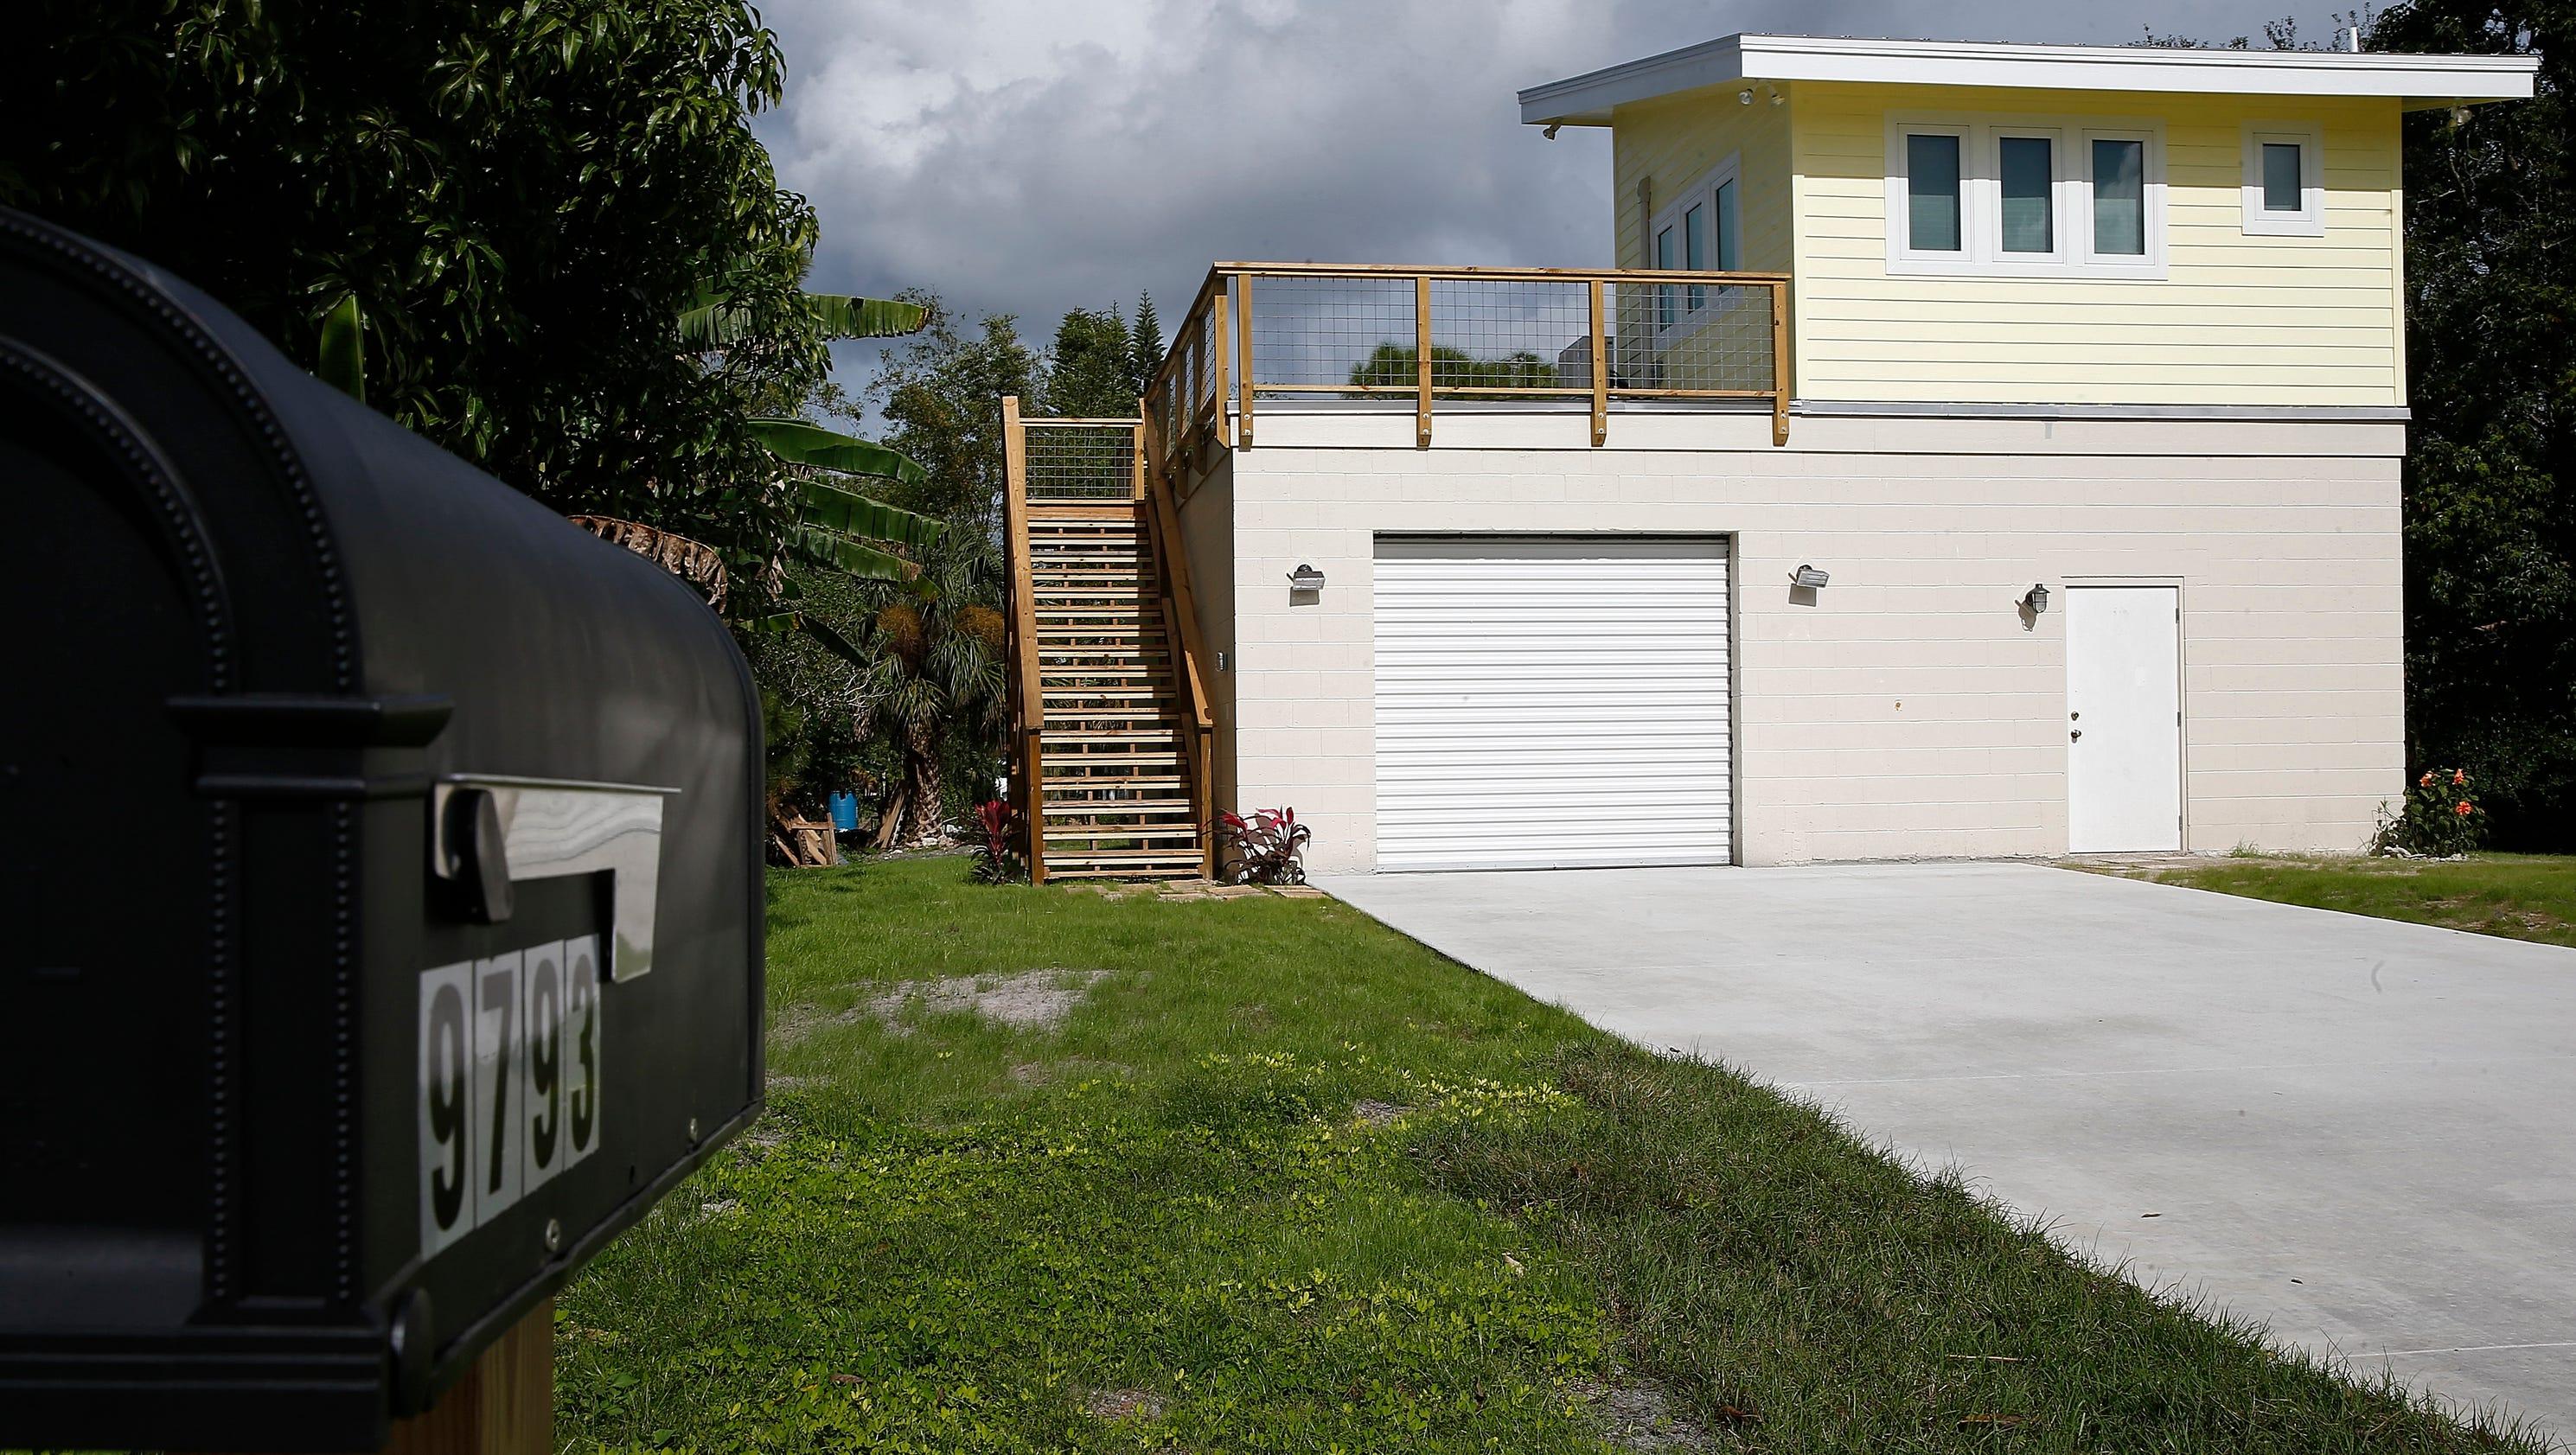 Big Idea: A Village Of Tiny Homes For Homeless Veterans